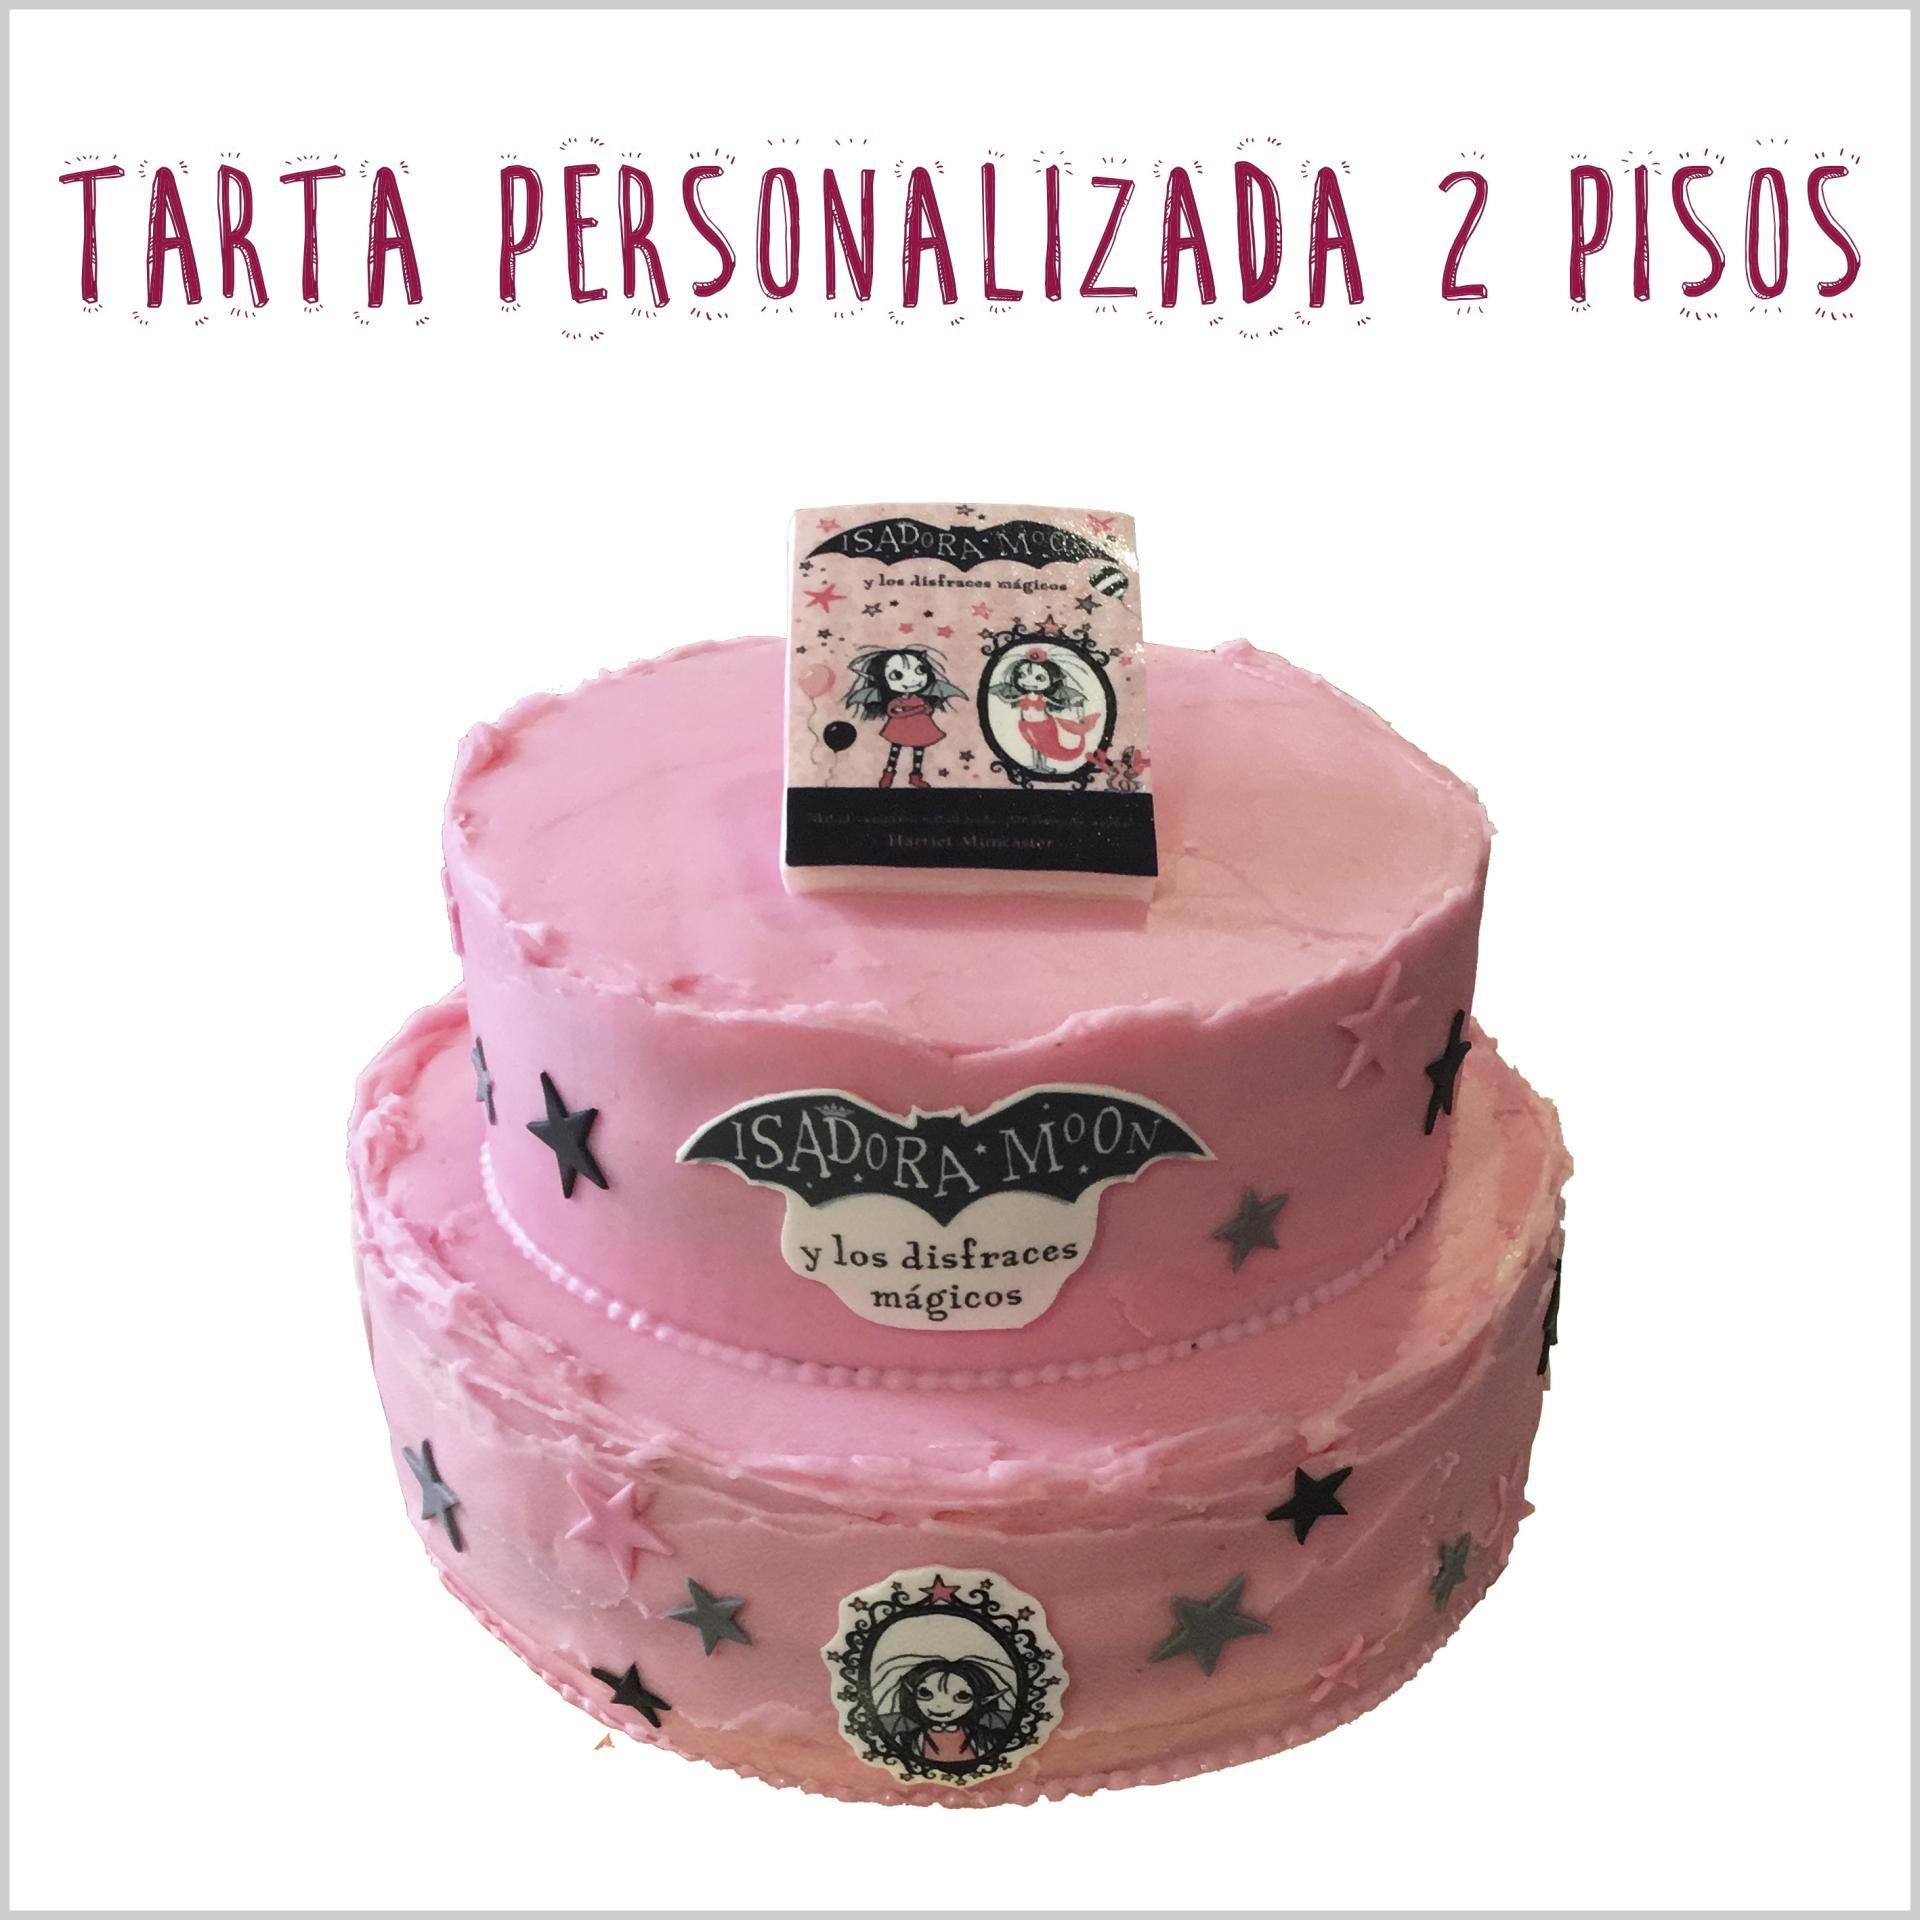 Tarta Personalizada 2 Pisos